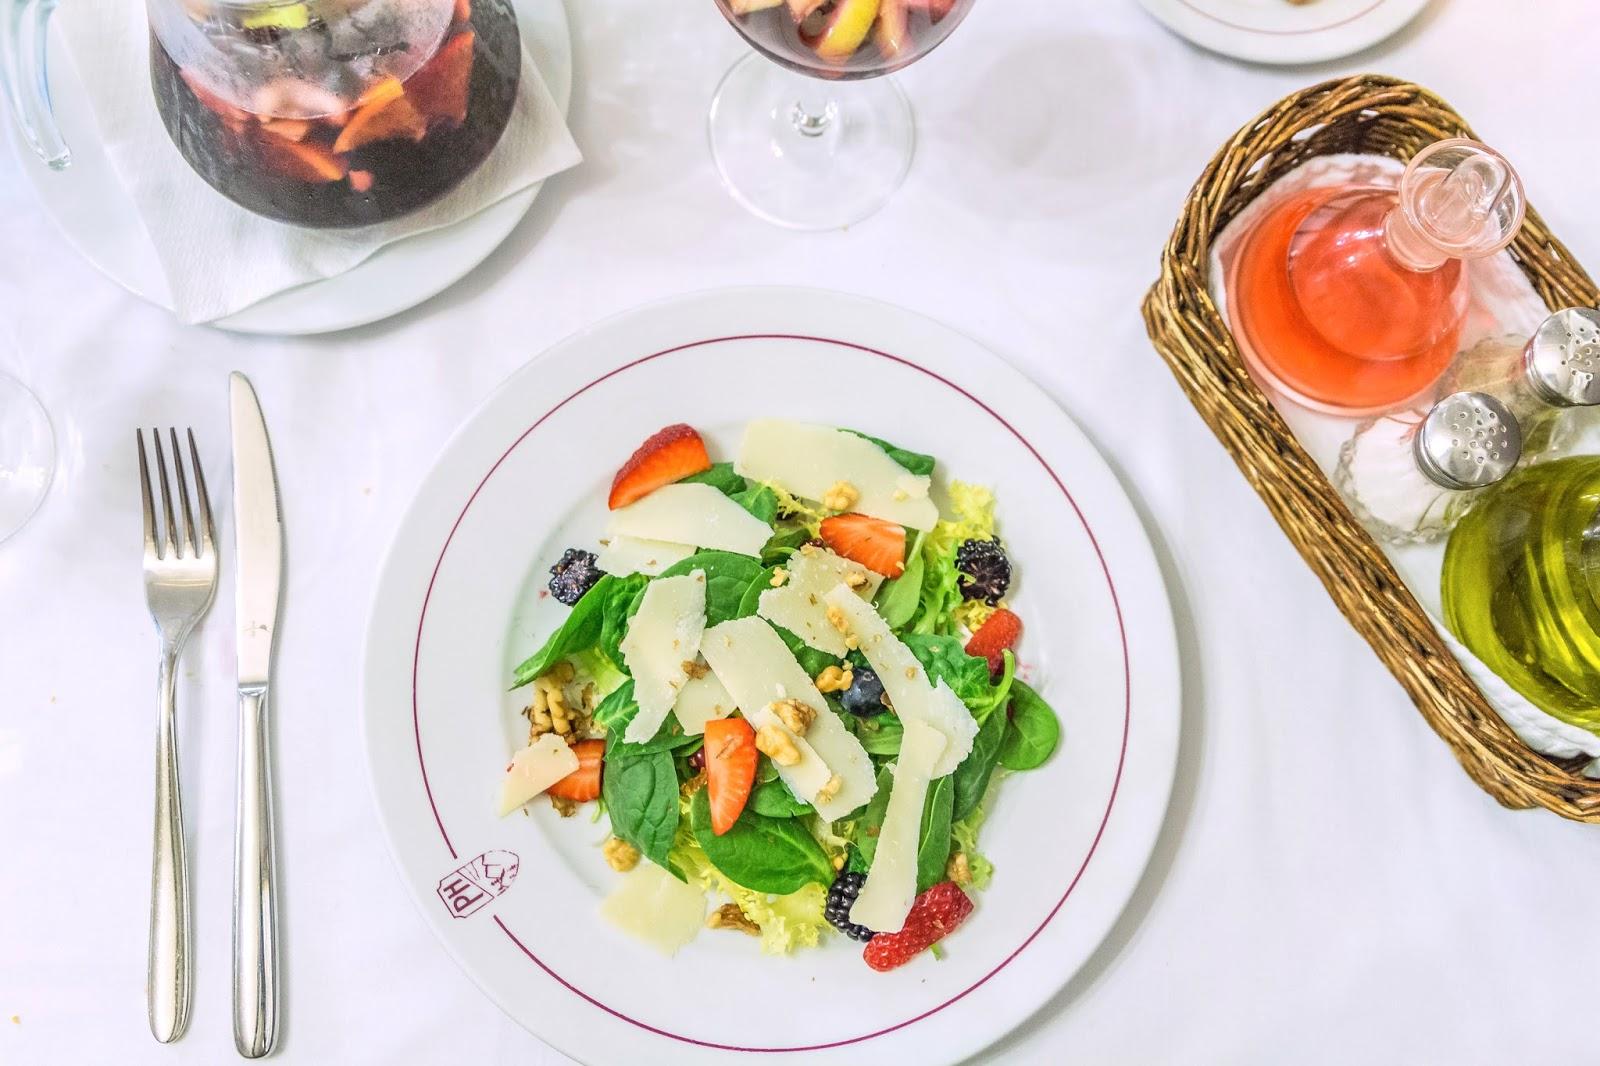 Andorre La Vieille restaurant